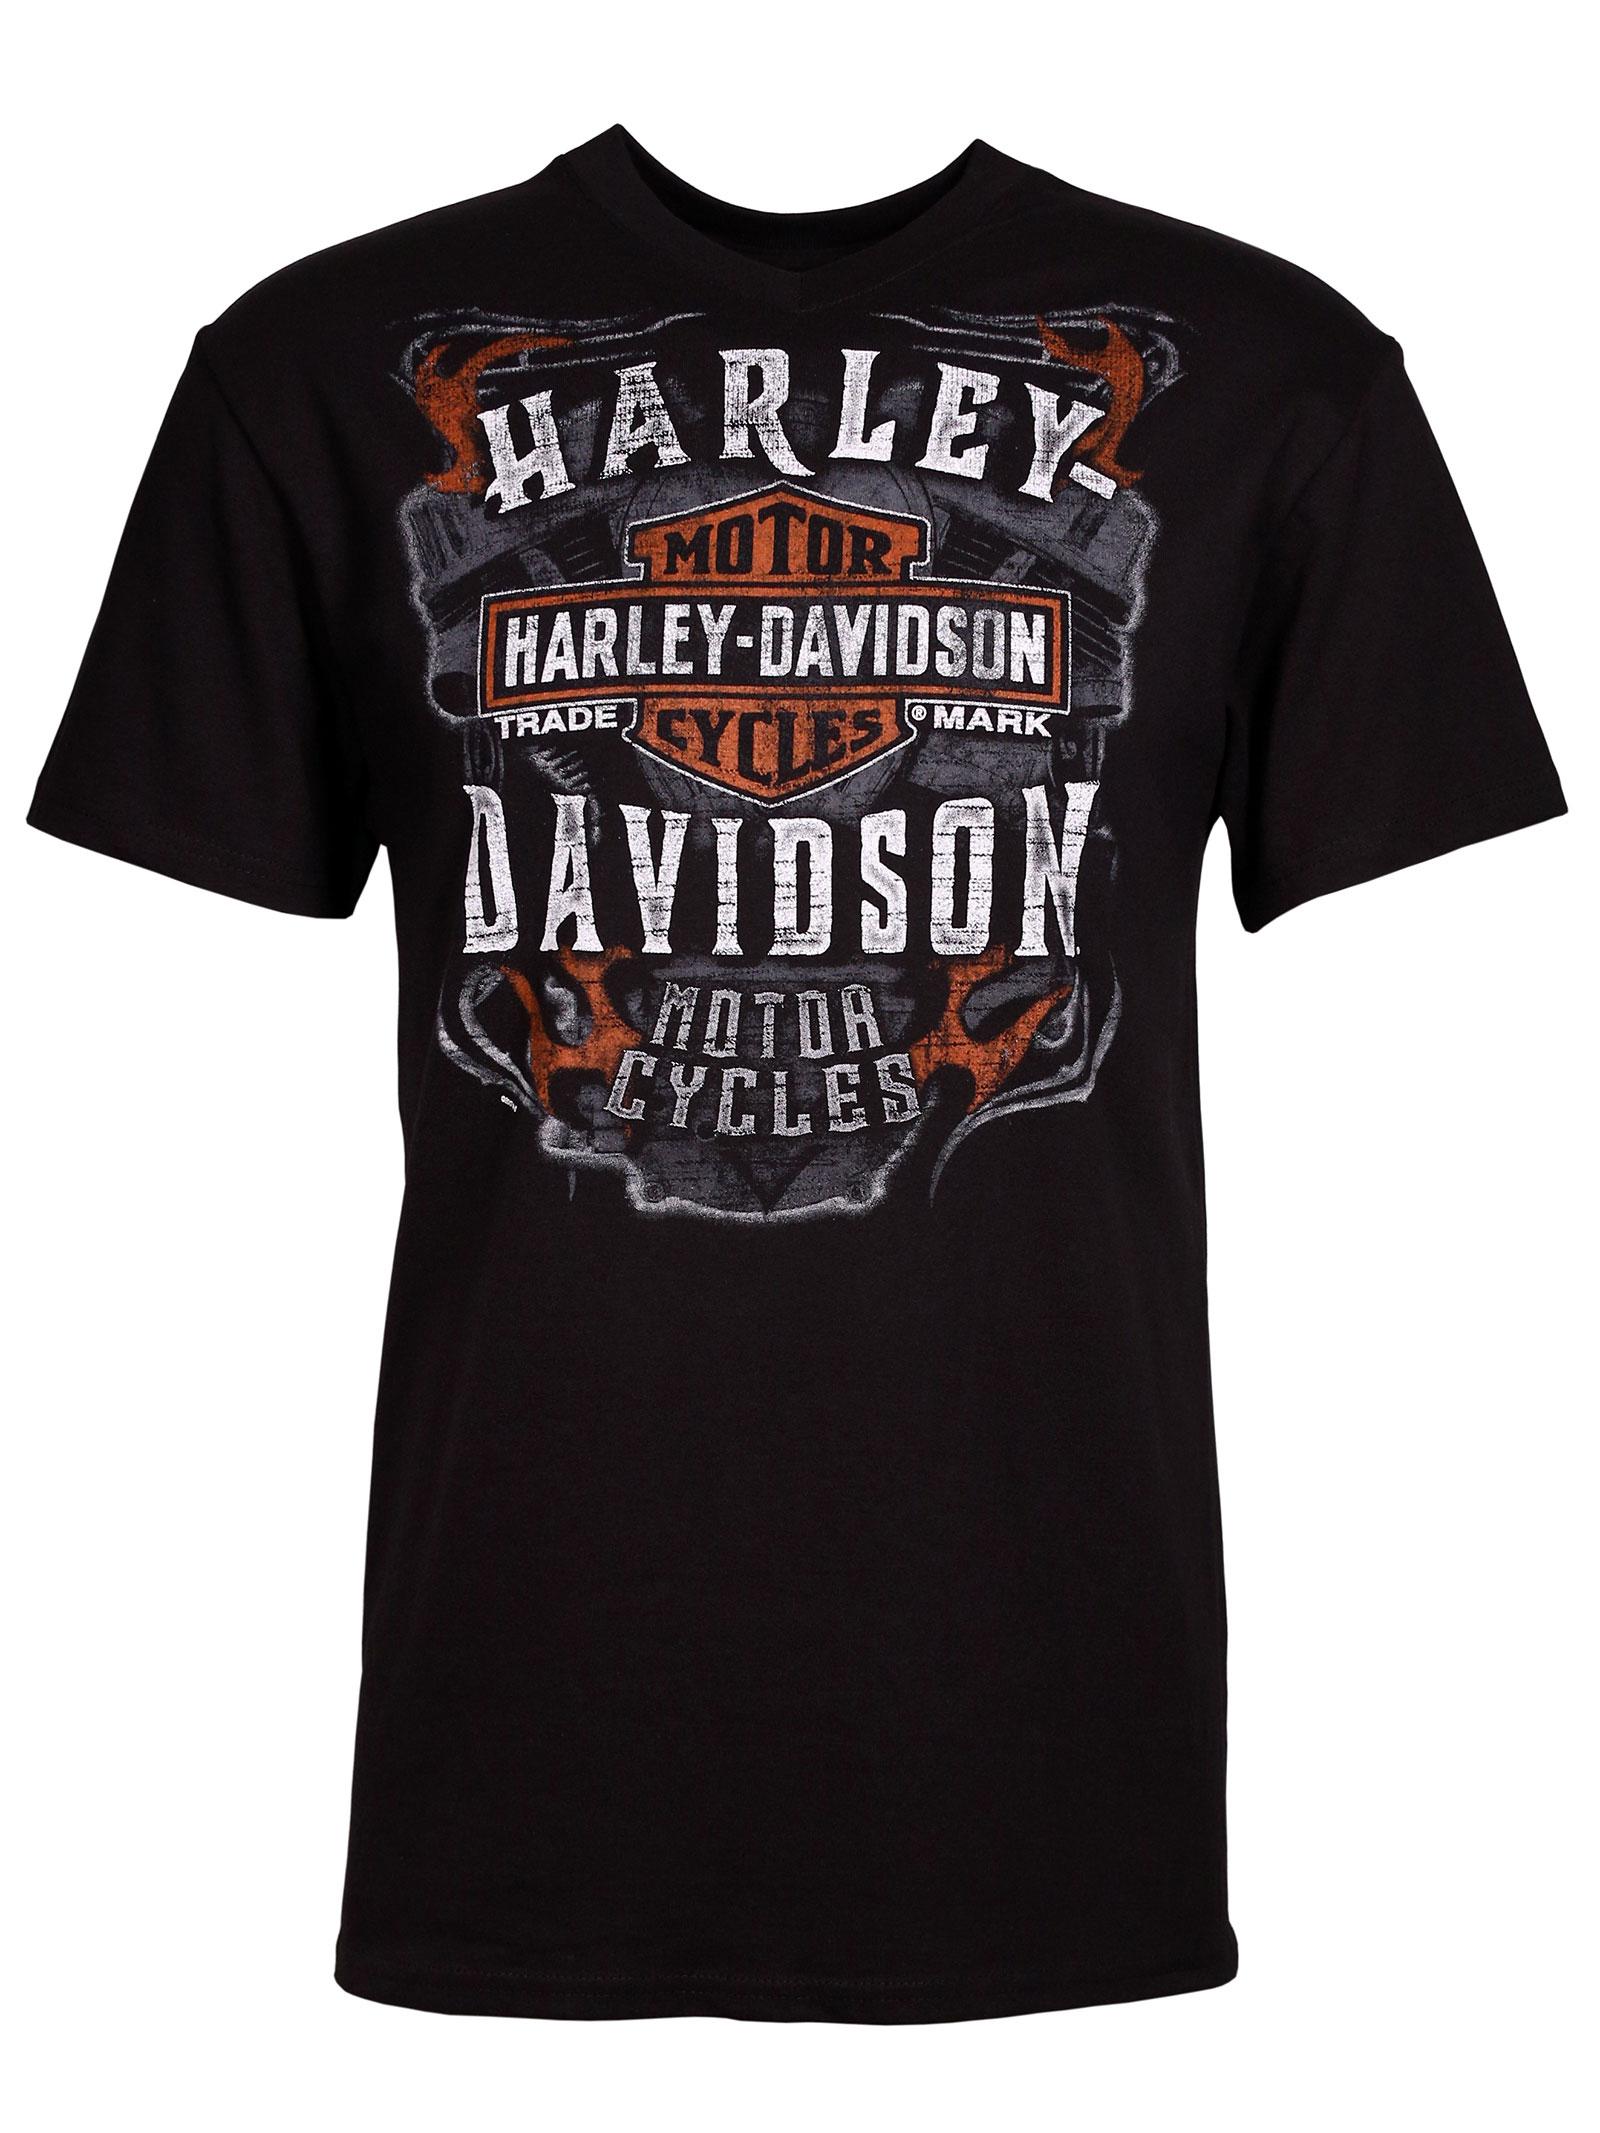 harley davidson t shirt adverse thirst im thunderbike shop. Black Bedroom Furniture Sets. Home Design Ideas